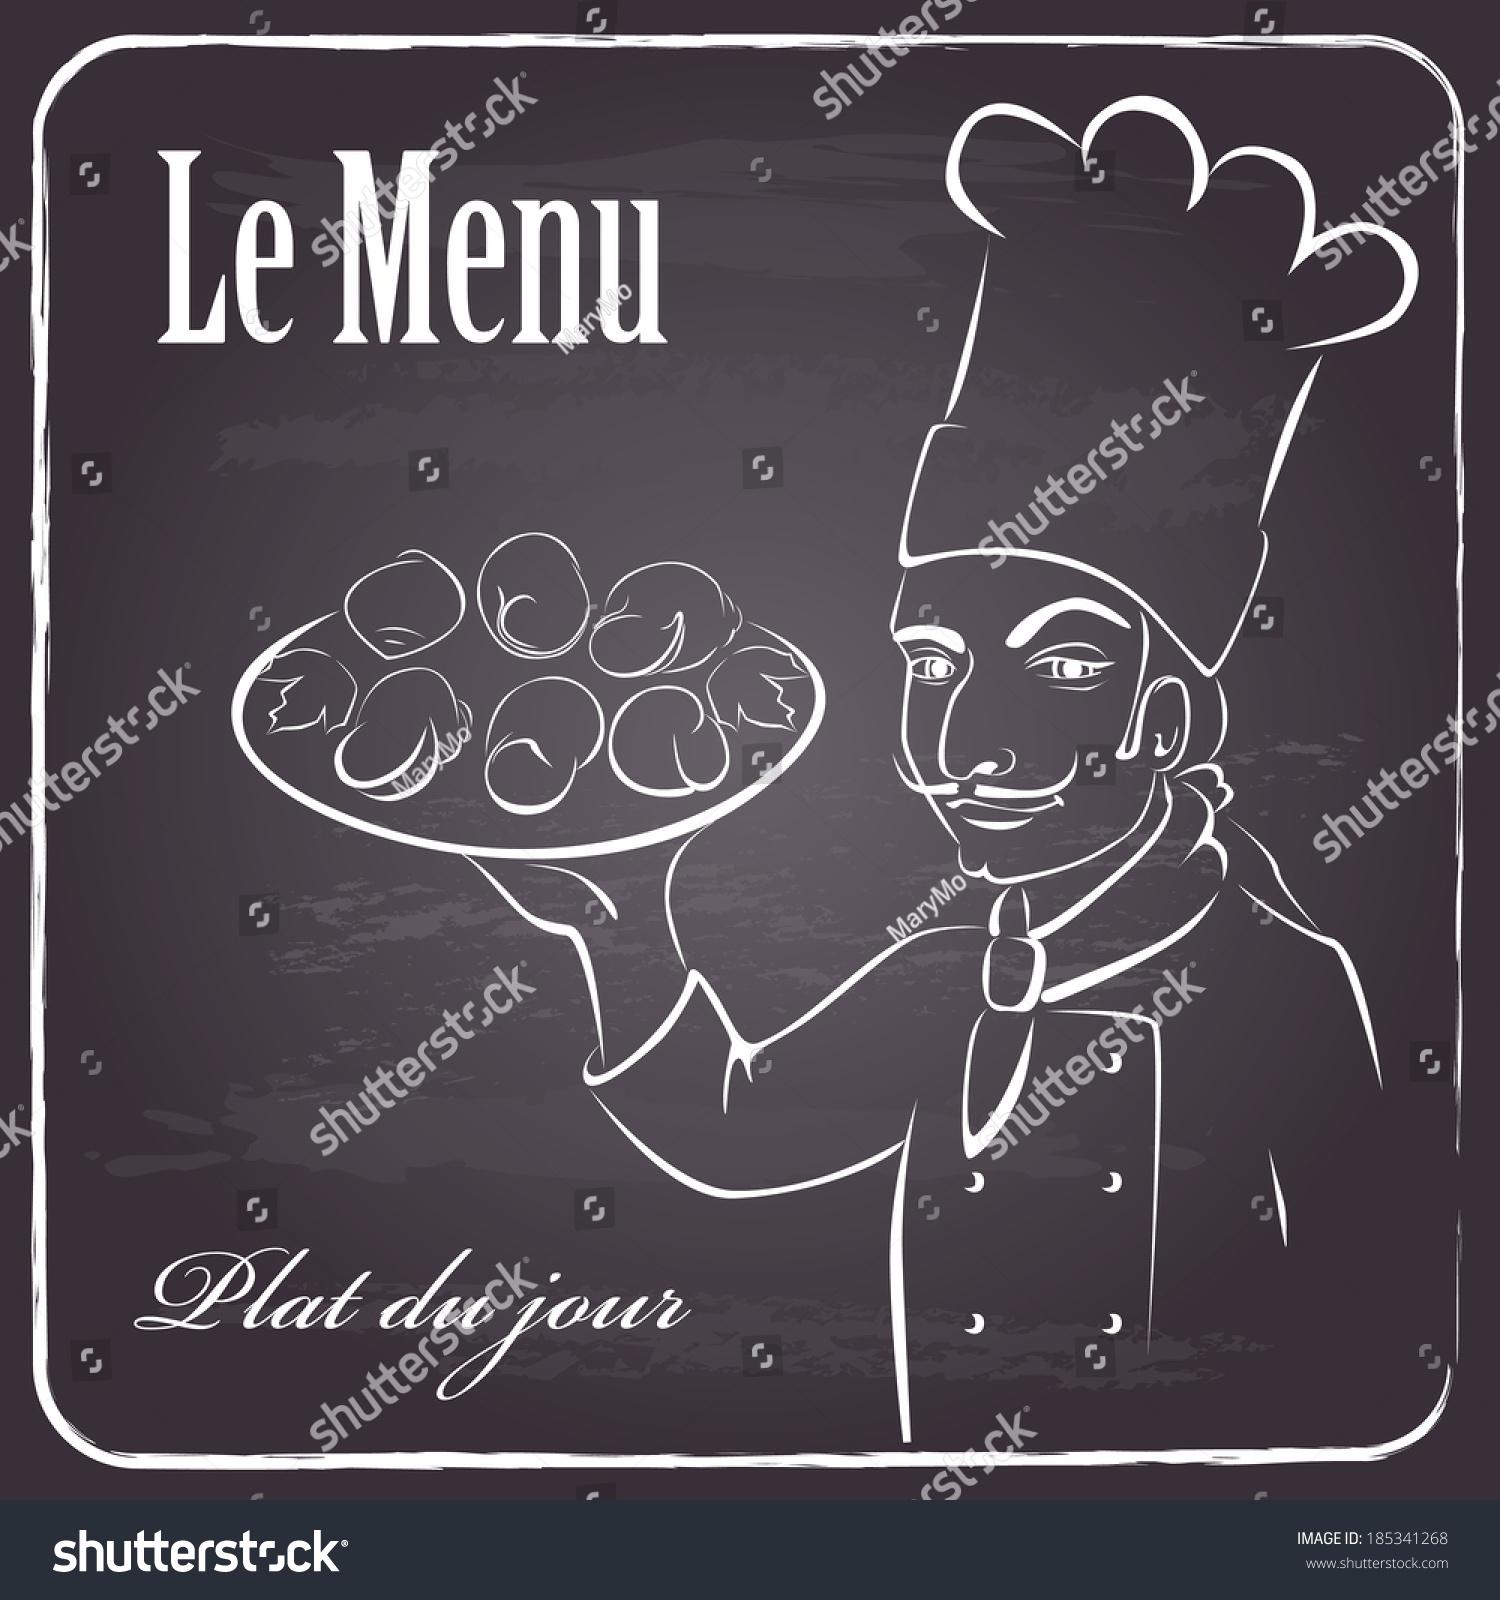 menu background restaurant on chalkboardfrench chef stock vector